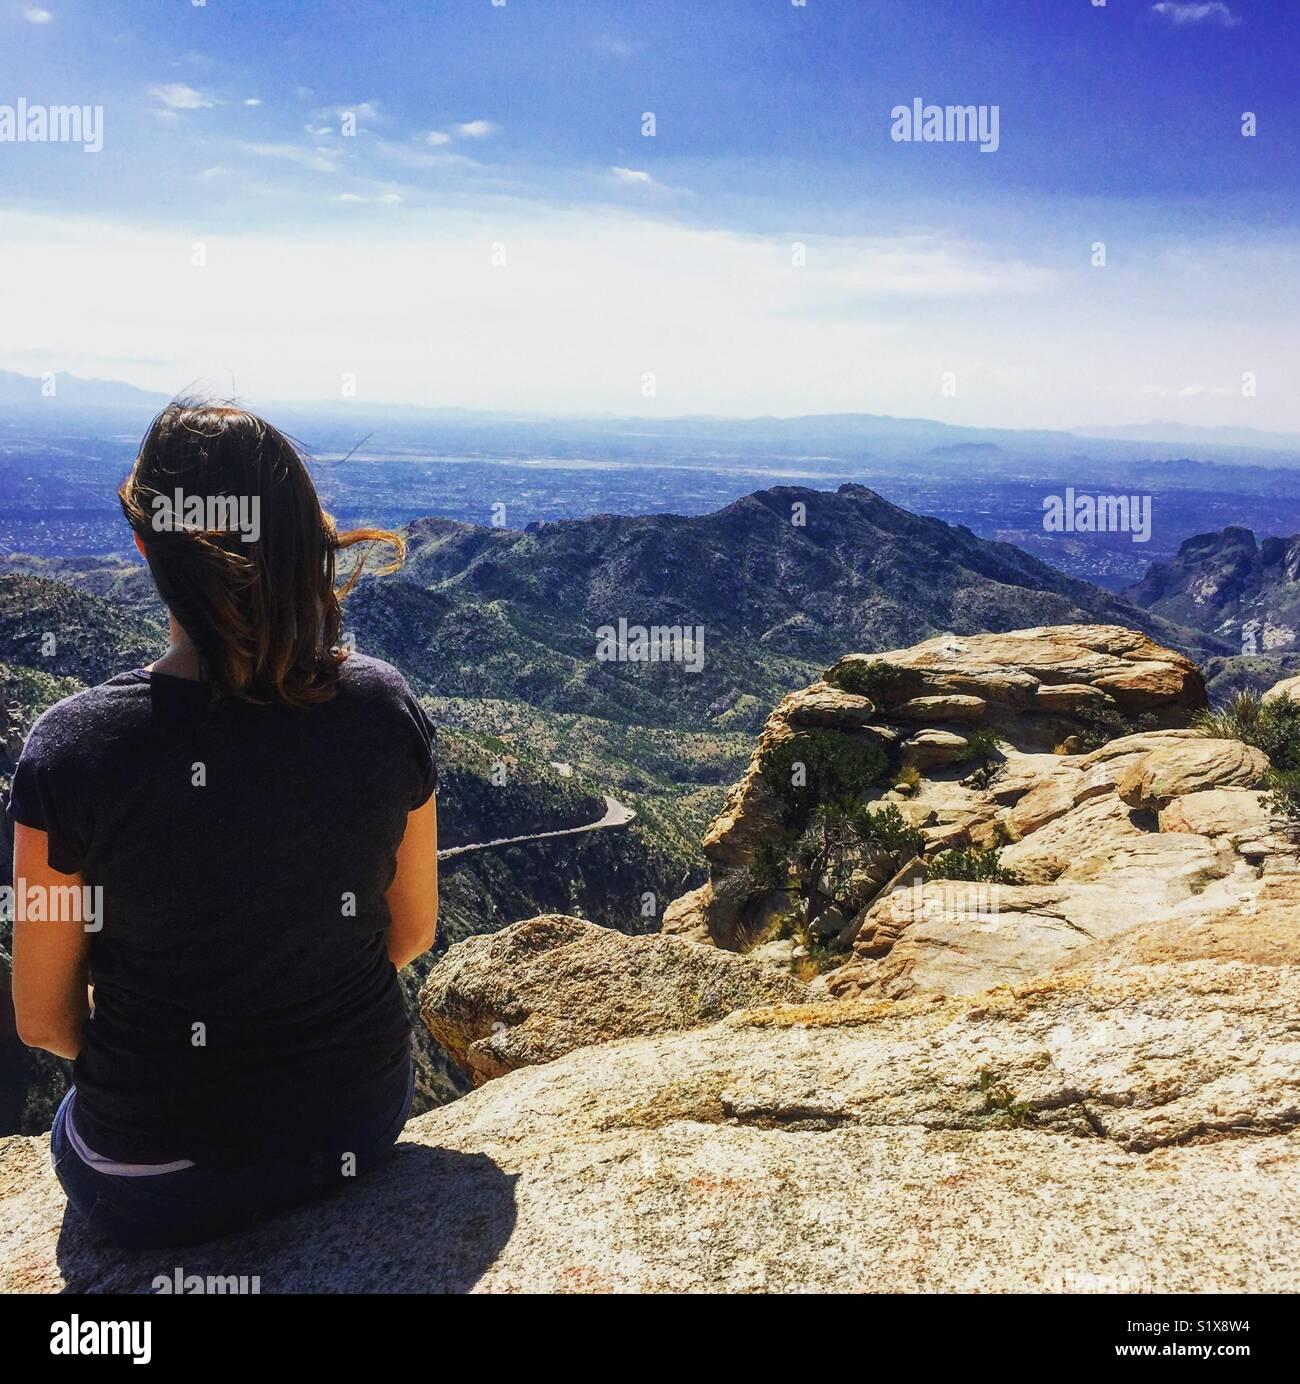 Arizona Beauty - Stock Image